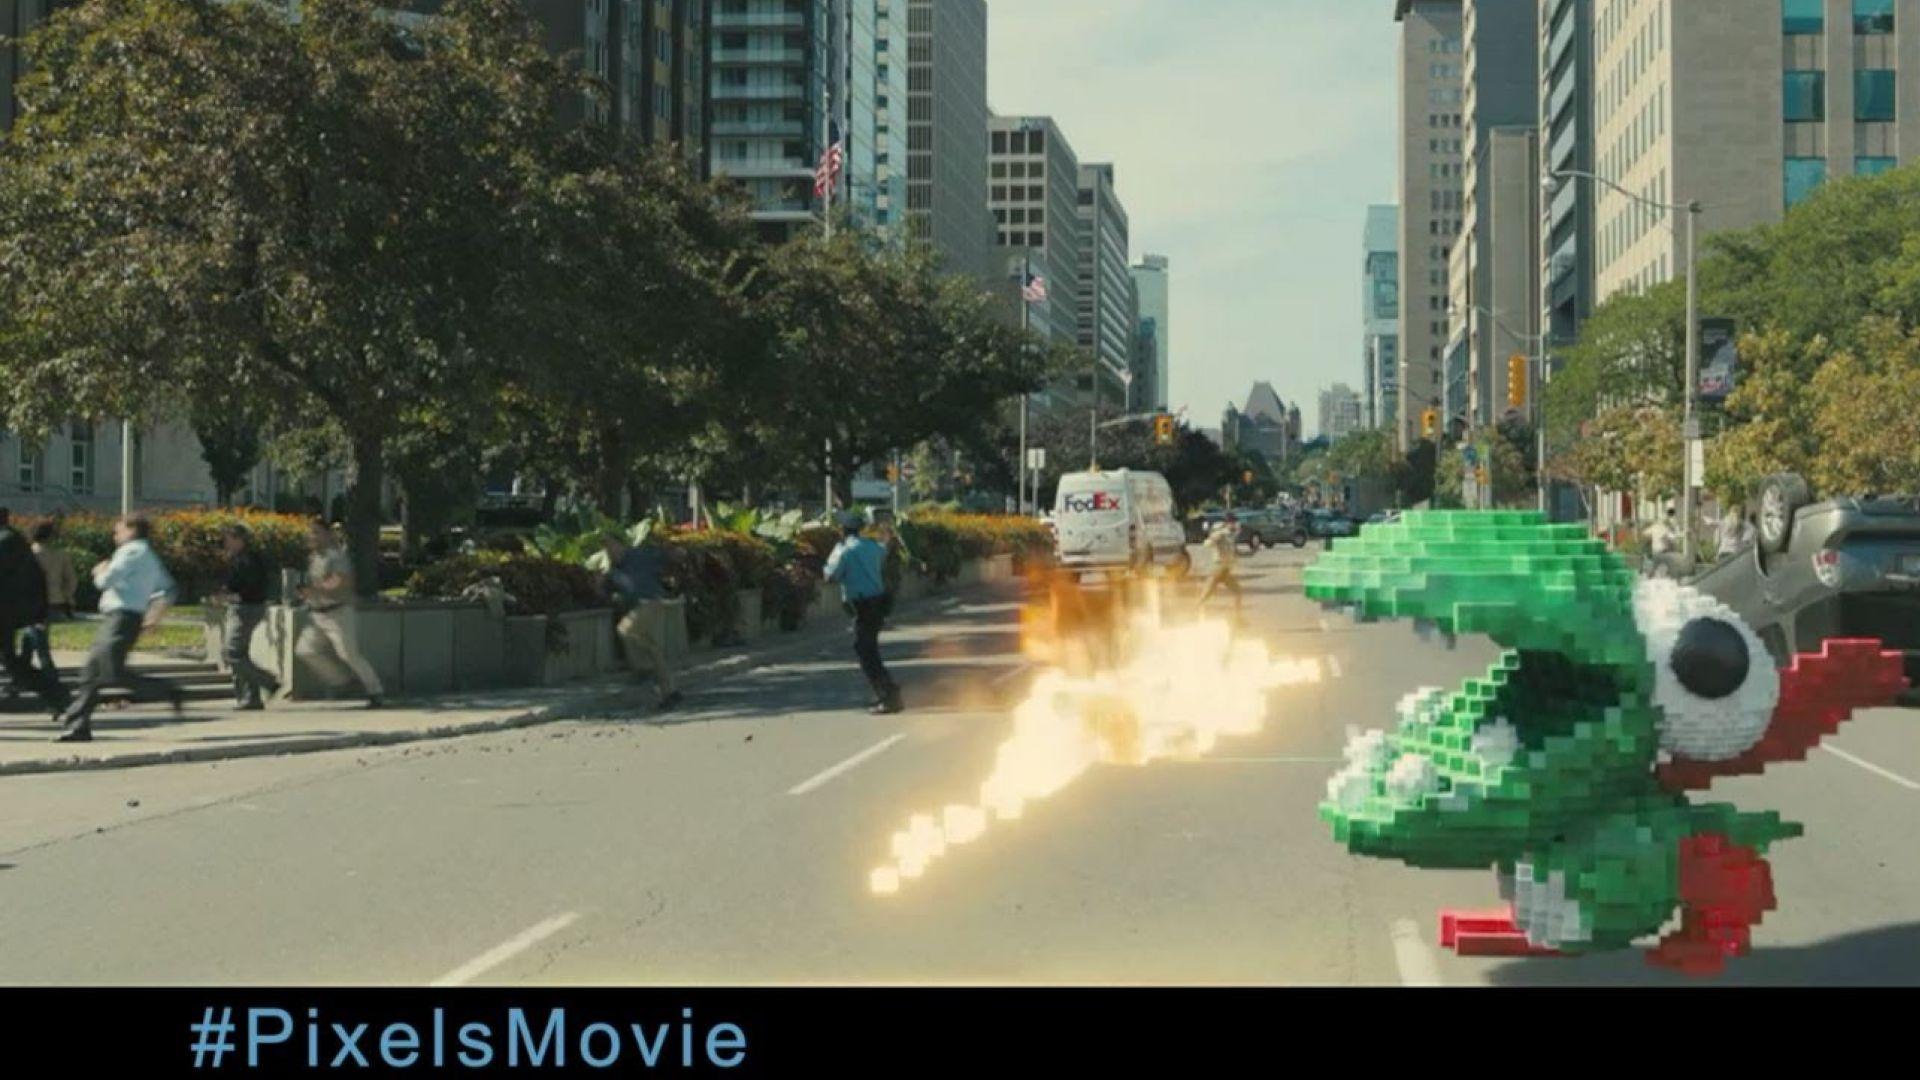 New 'Pixels' Featurette Explores the Video Game World